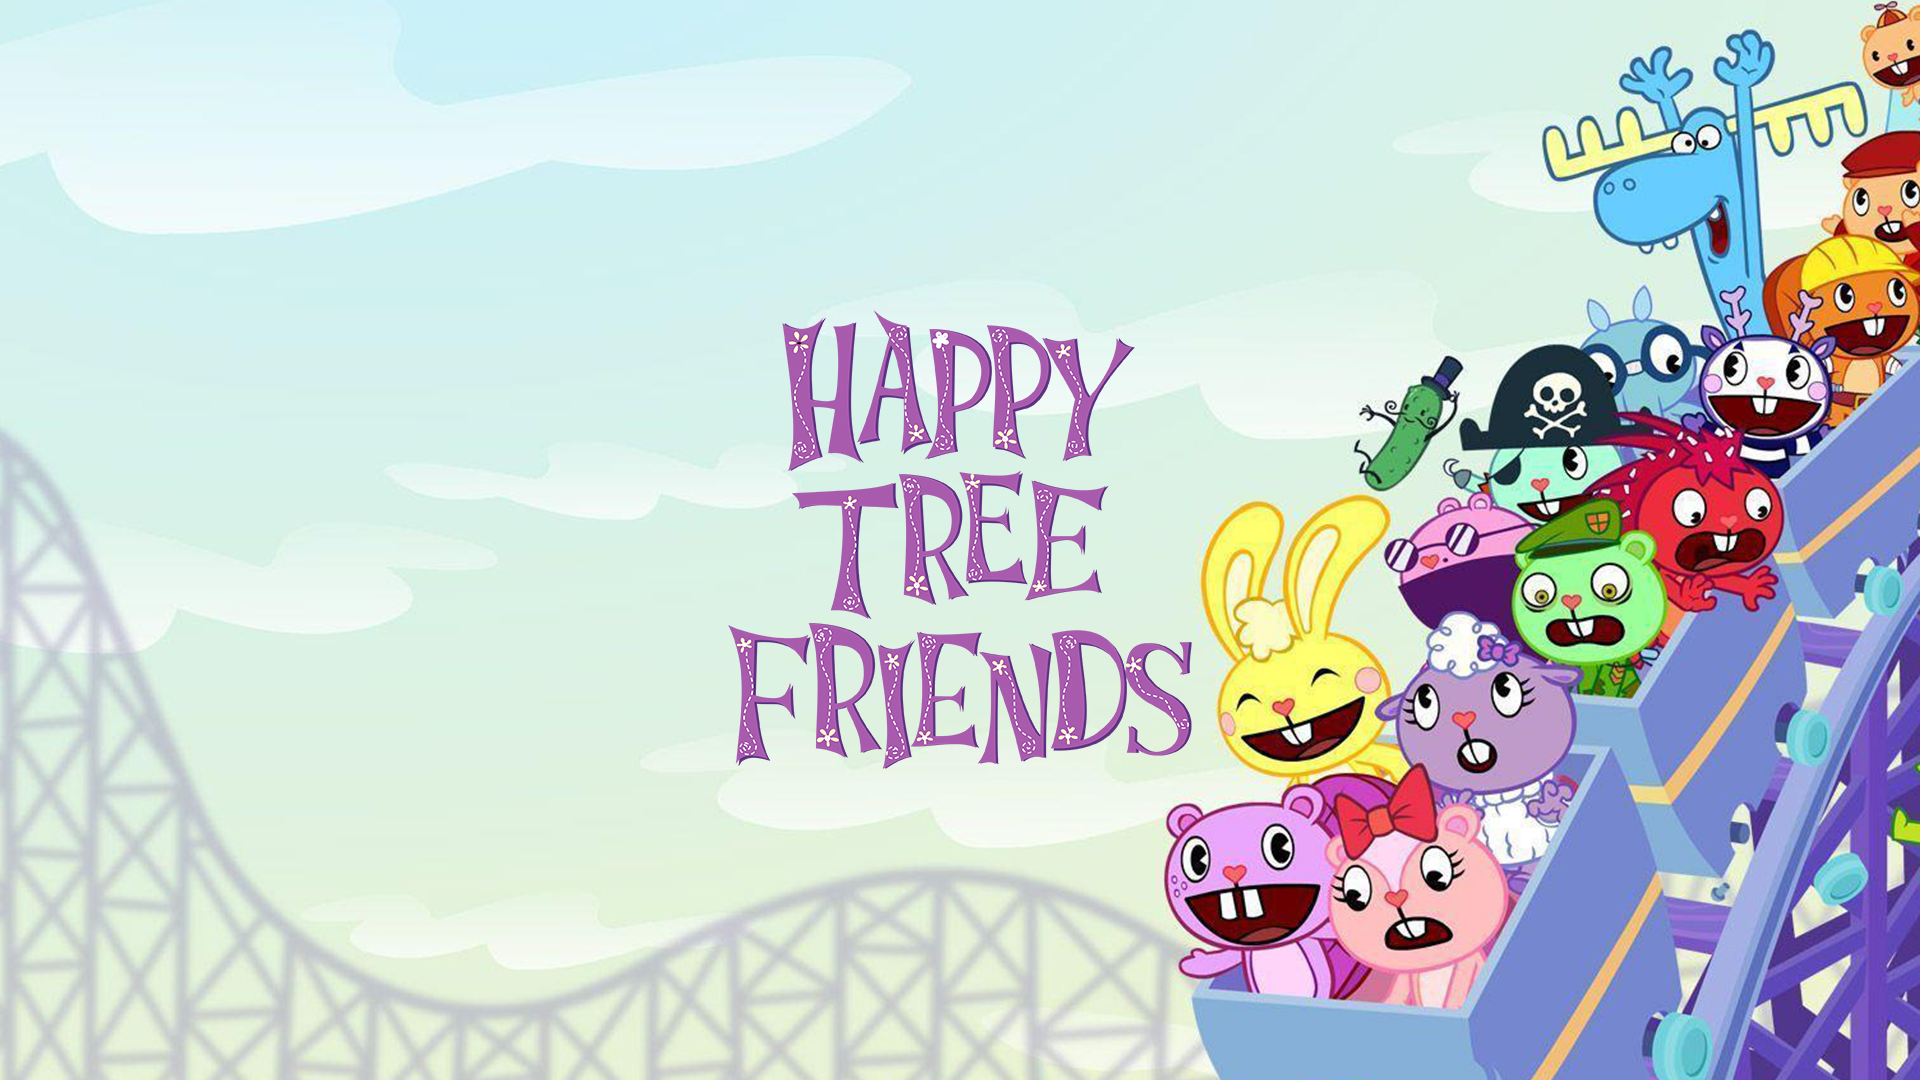 Show Happy Tree Friends Mobibase Programs